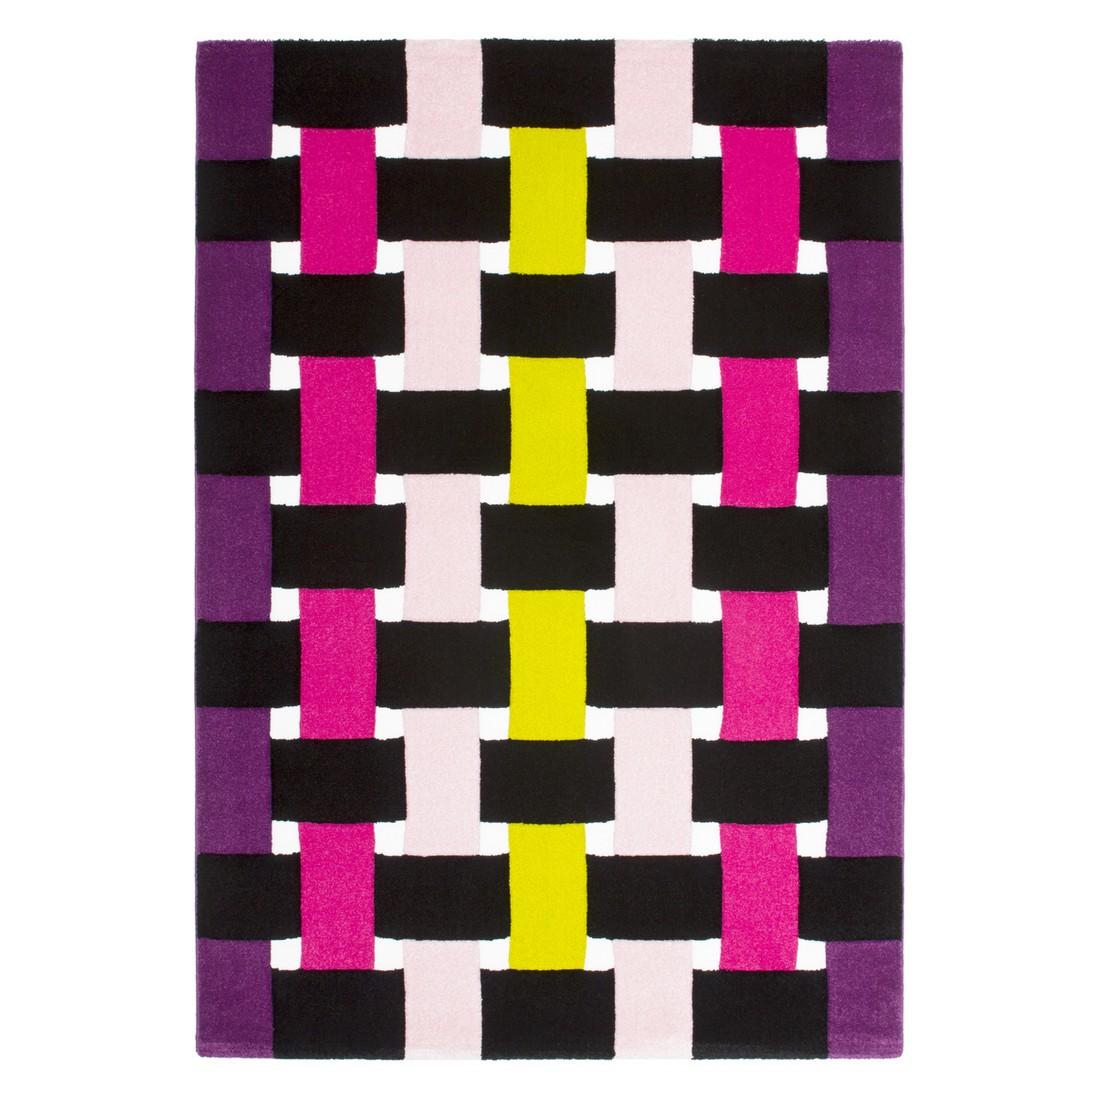 Teppich Tetris – Lila/Fuchsia – 200 x 290 cm, Obsession jetzt kaufen